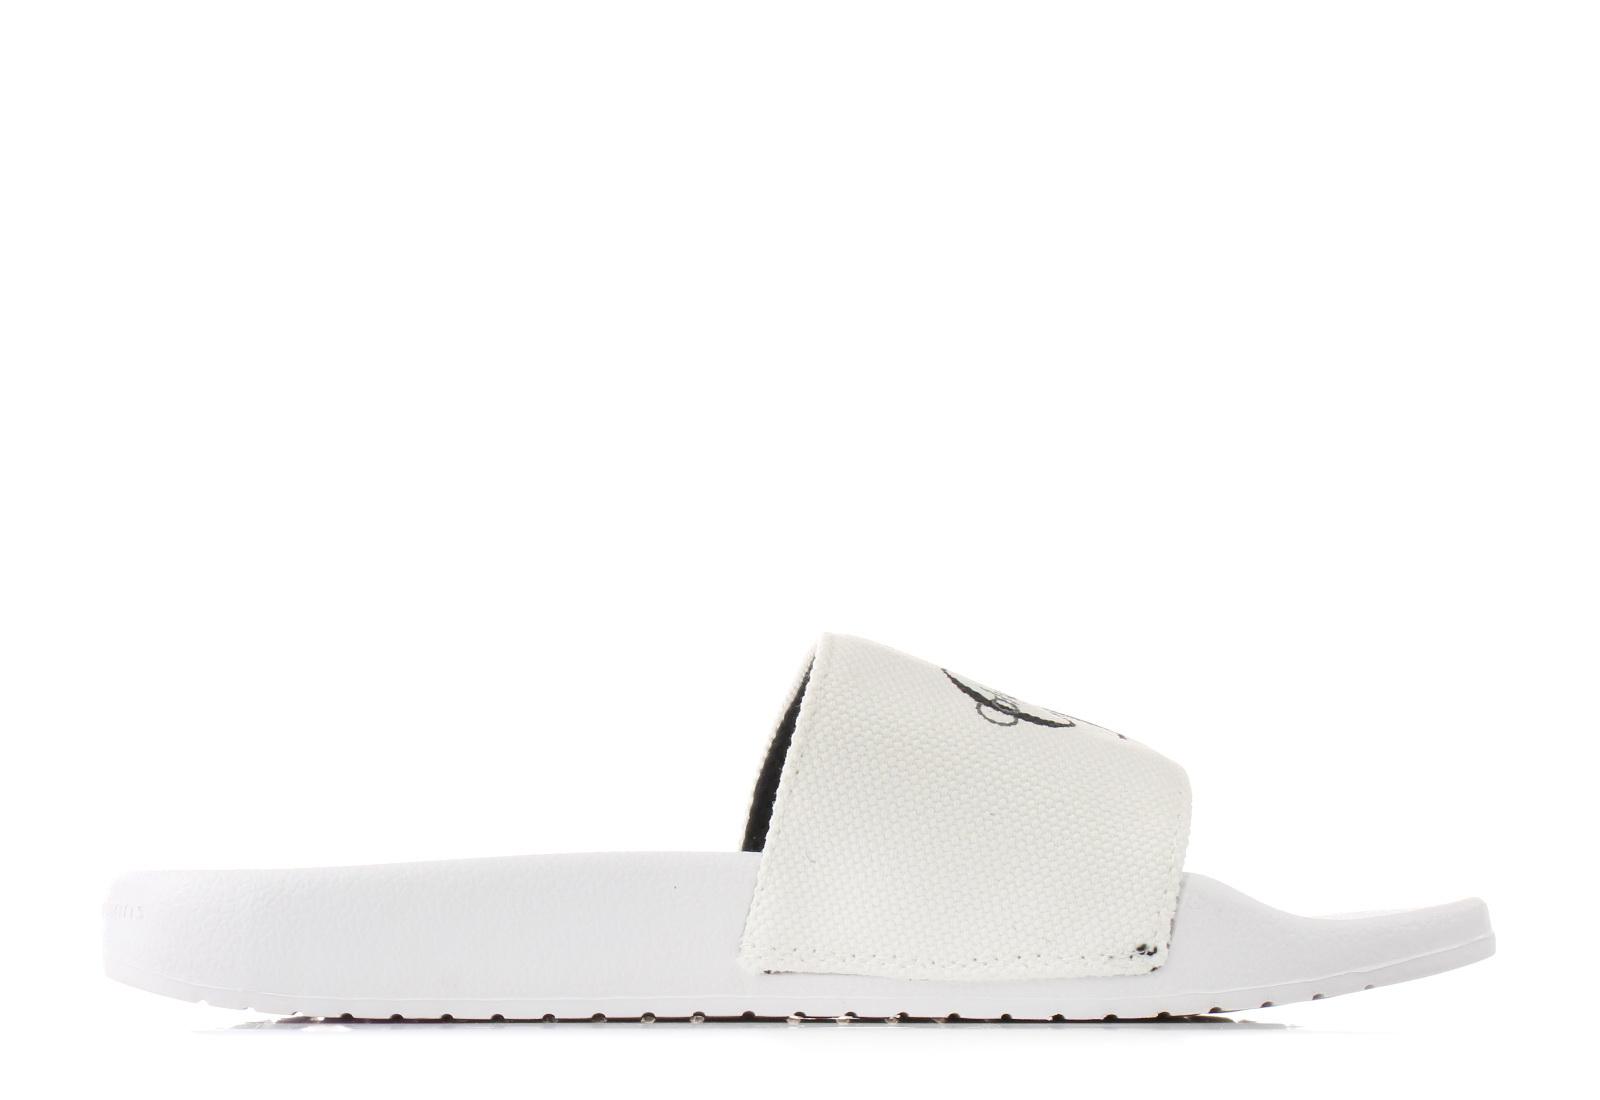 d965cead7b Calvin Klein Jeans Casual Bela Papuče - Chantal - Office Shoes Srbija